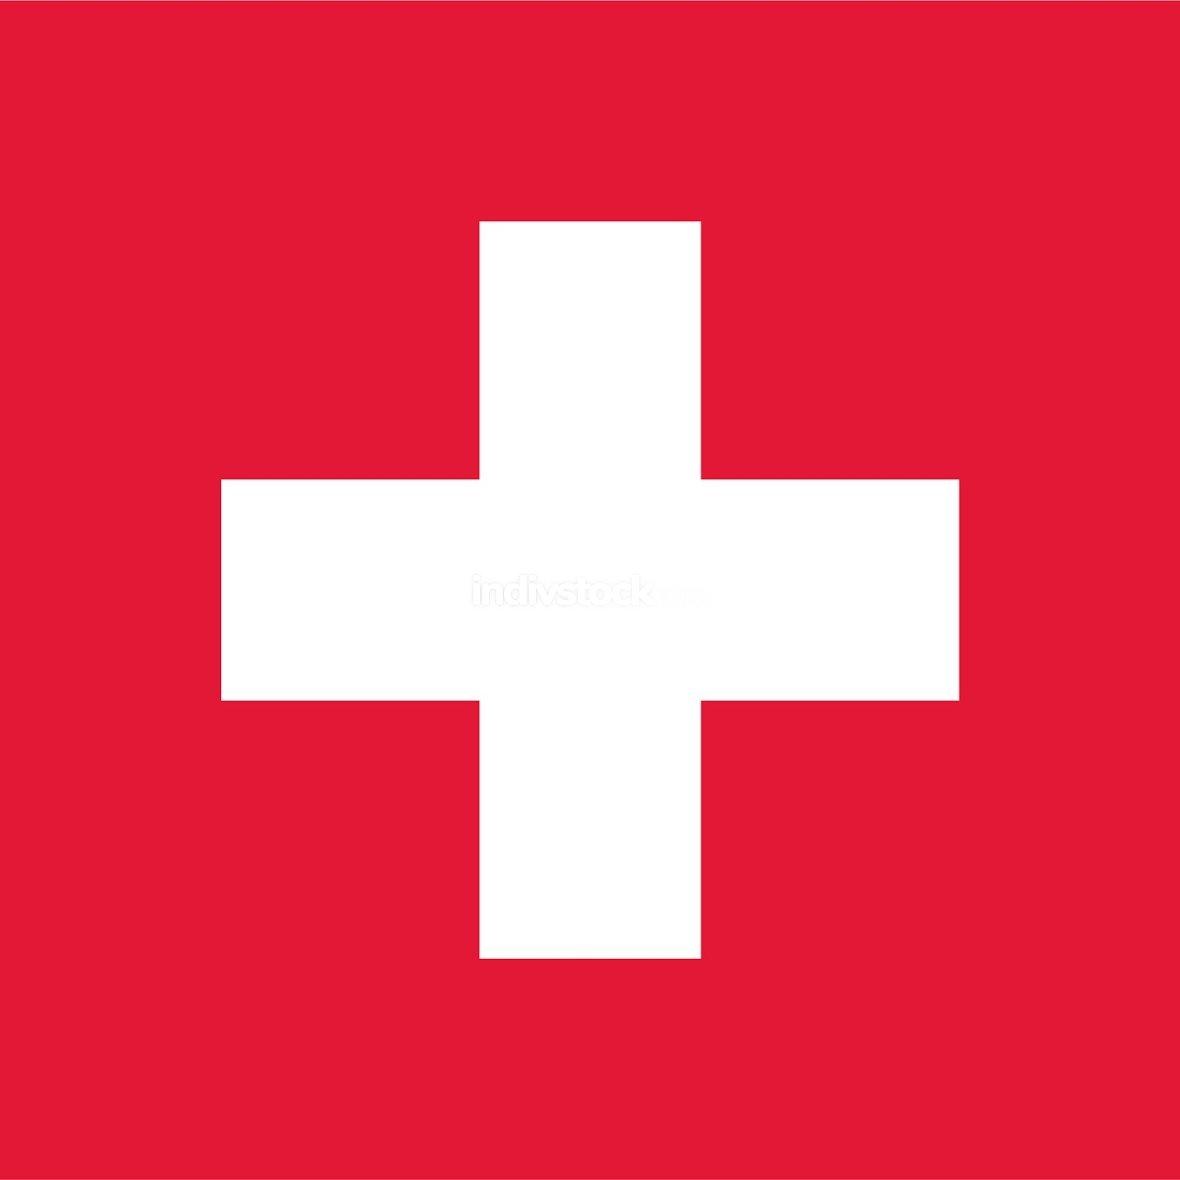 Switzerland officially flag